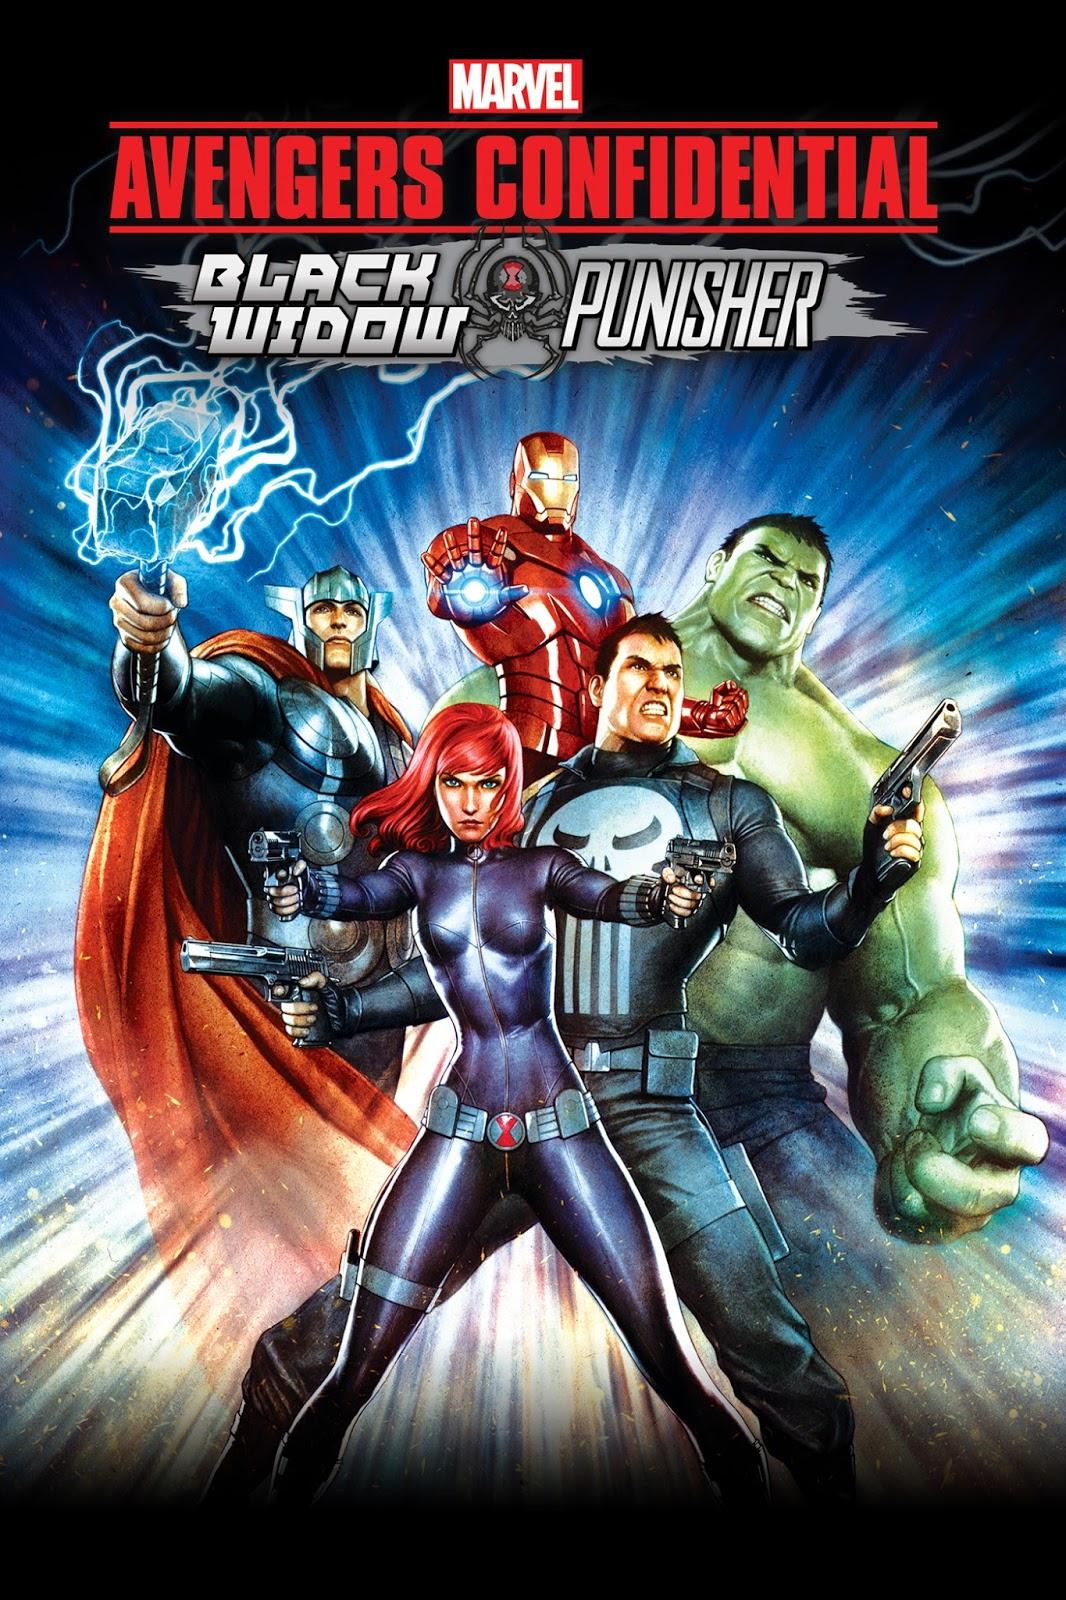 Avengers Los Archivos Secretos Black Widow Y Punisher (2014) [Dvdrip] [Latino]